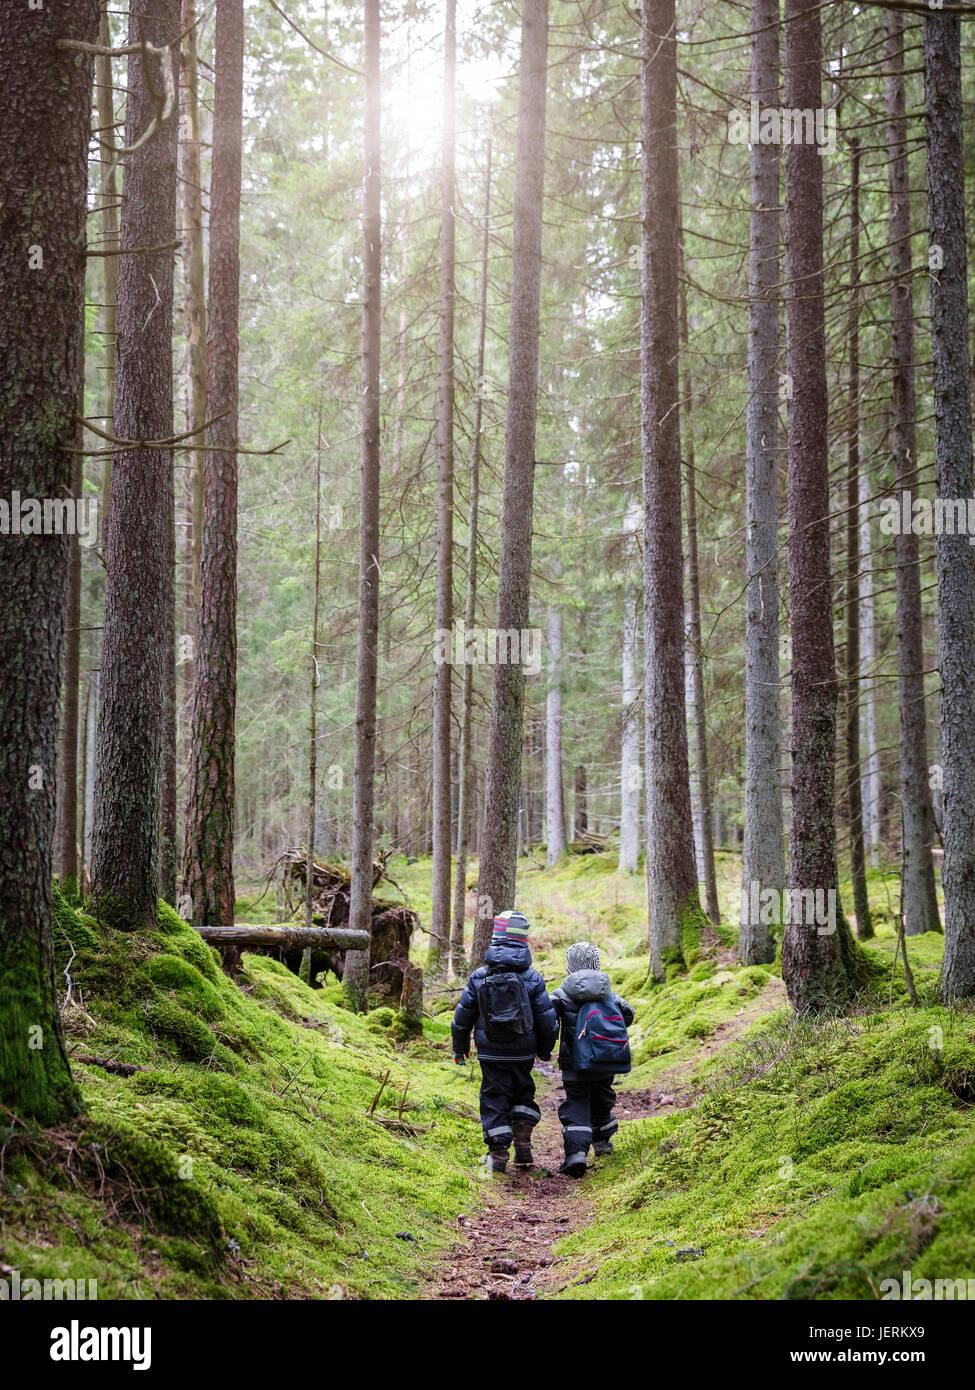 Children walking in forest - Stock Image